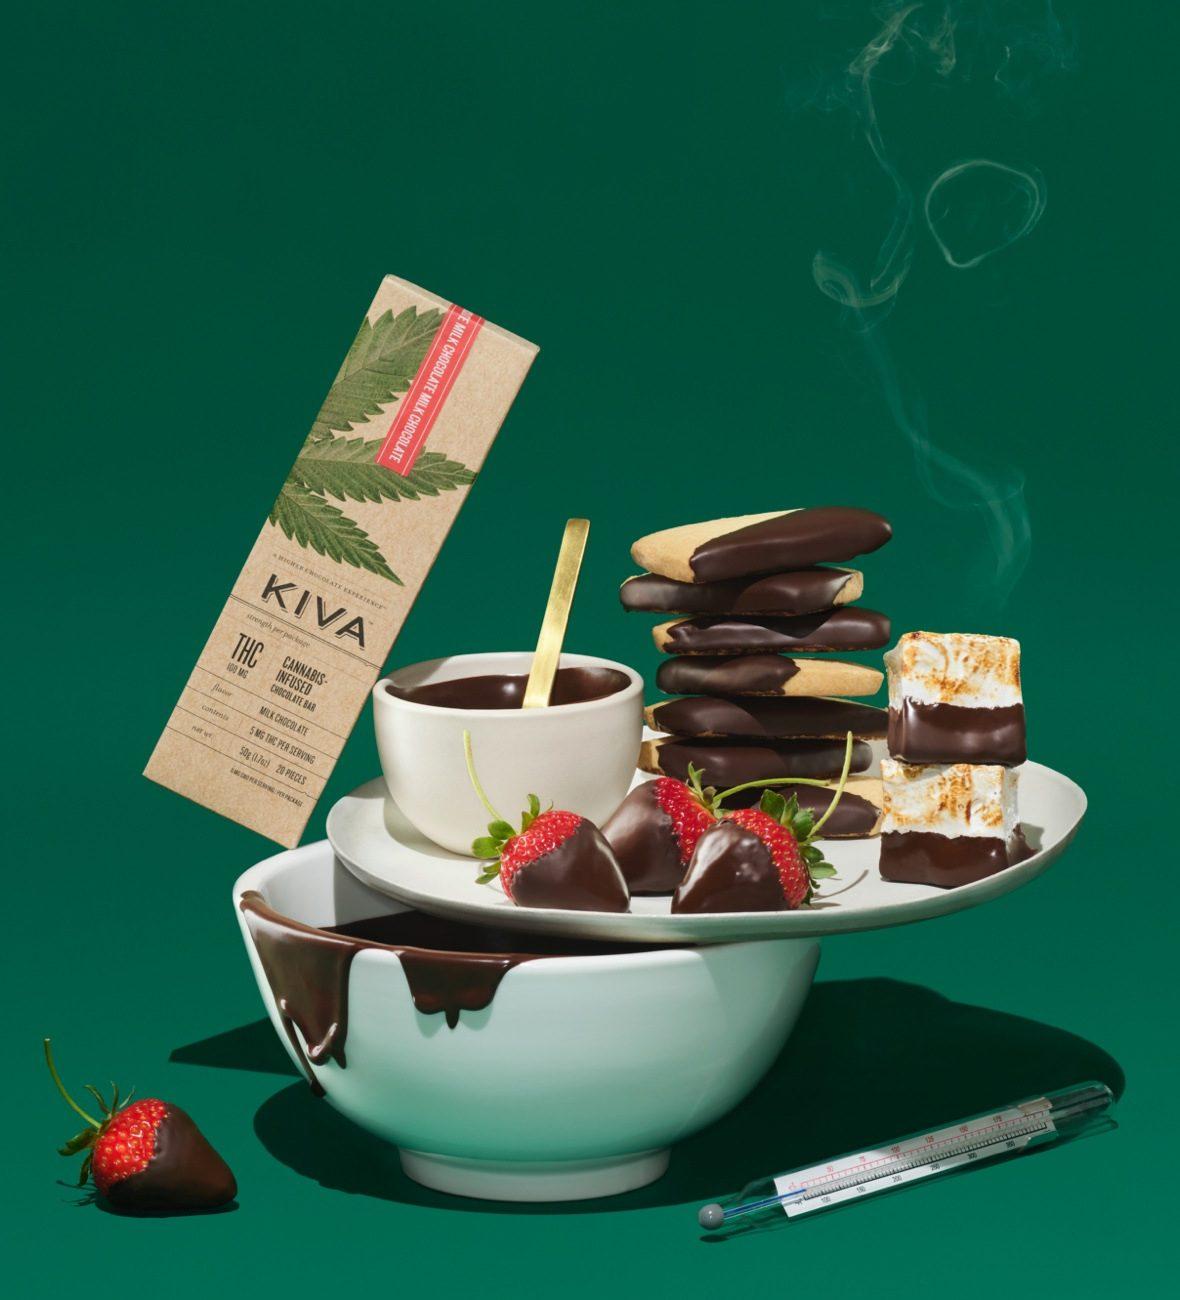 20191204 Blog Kiva Chocolate Covered Treats 1180x1300